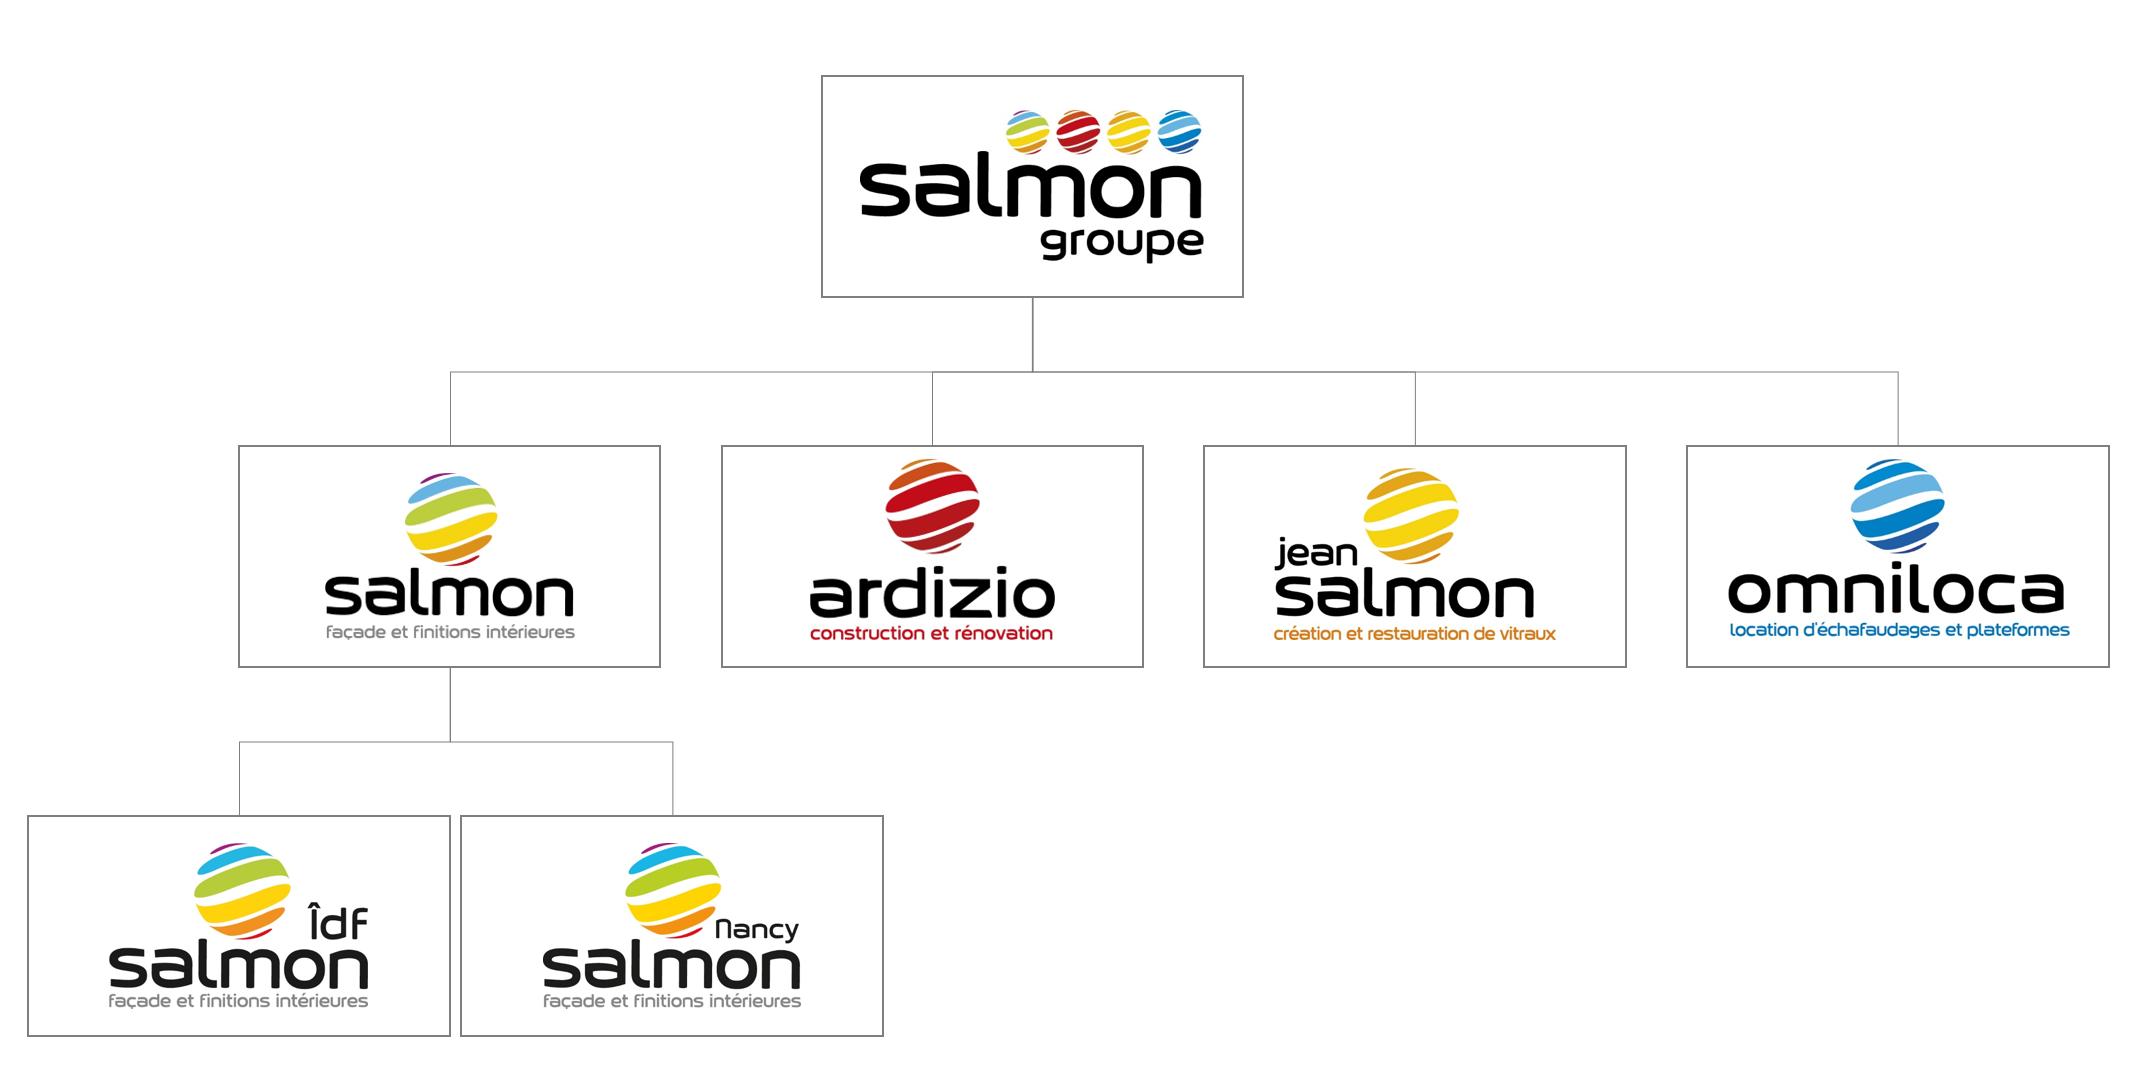 Groupe Salmon